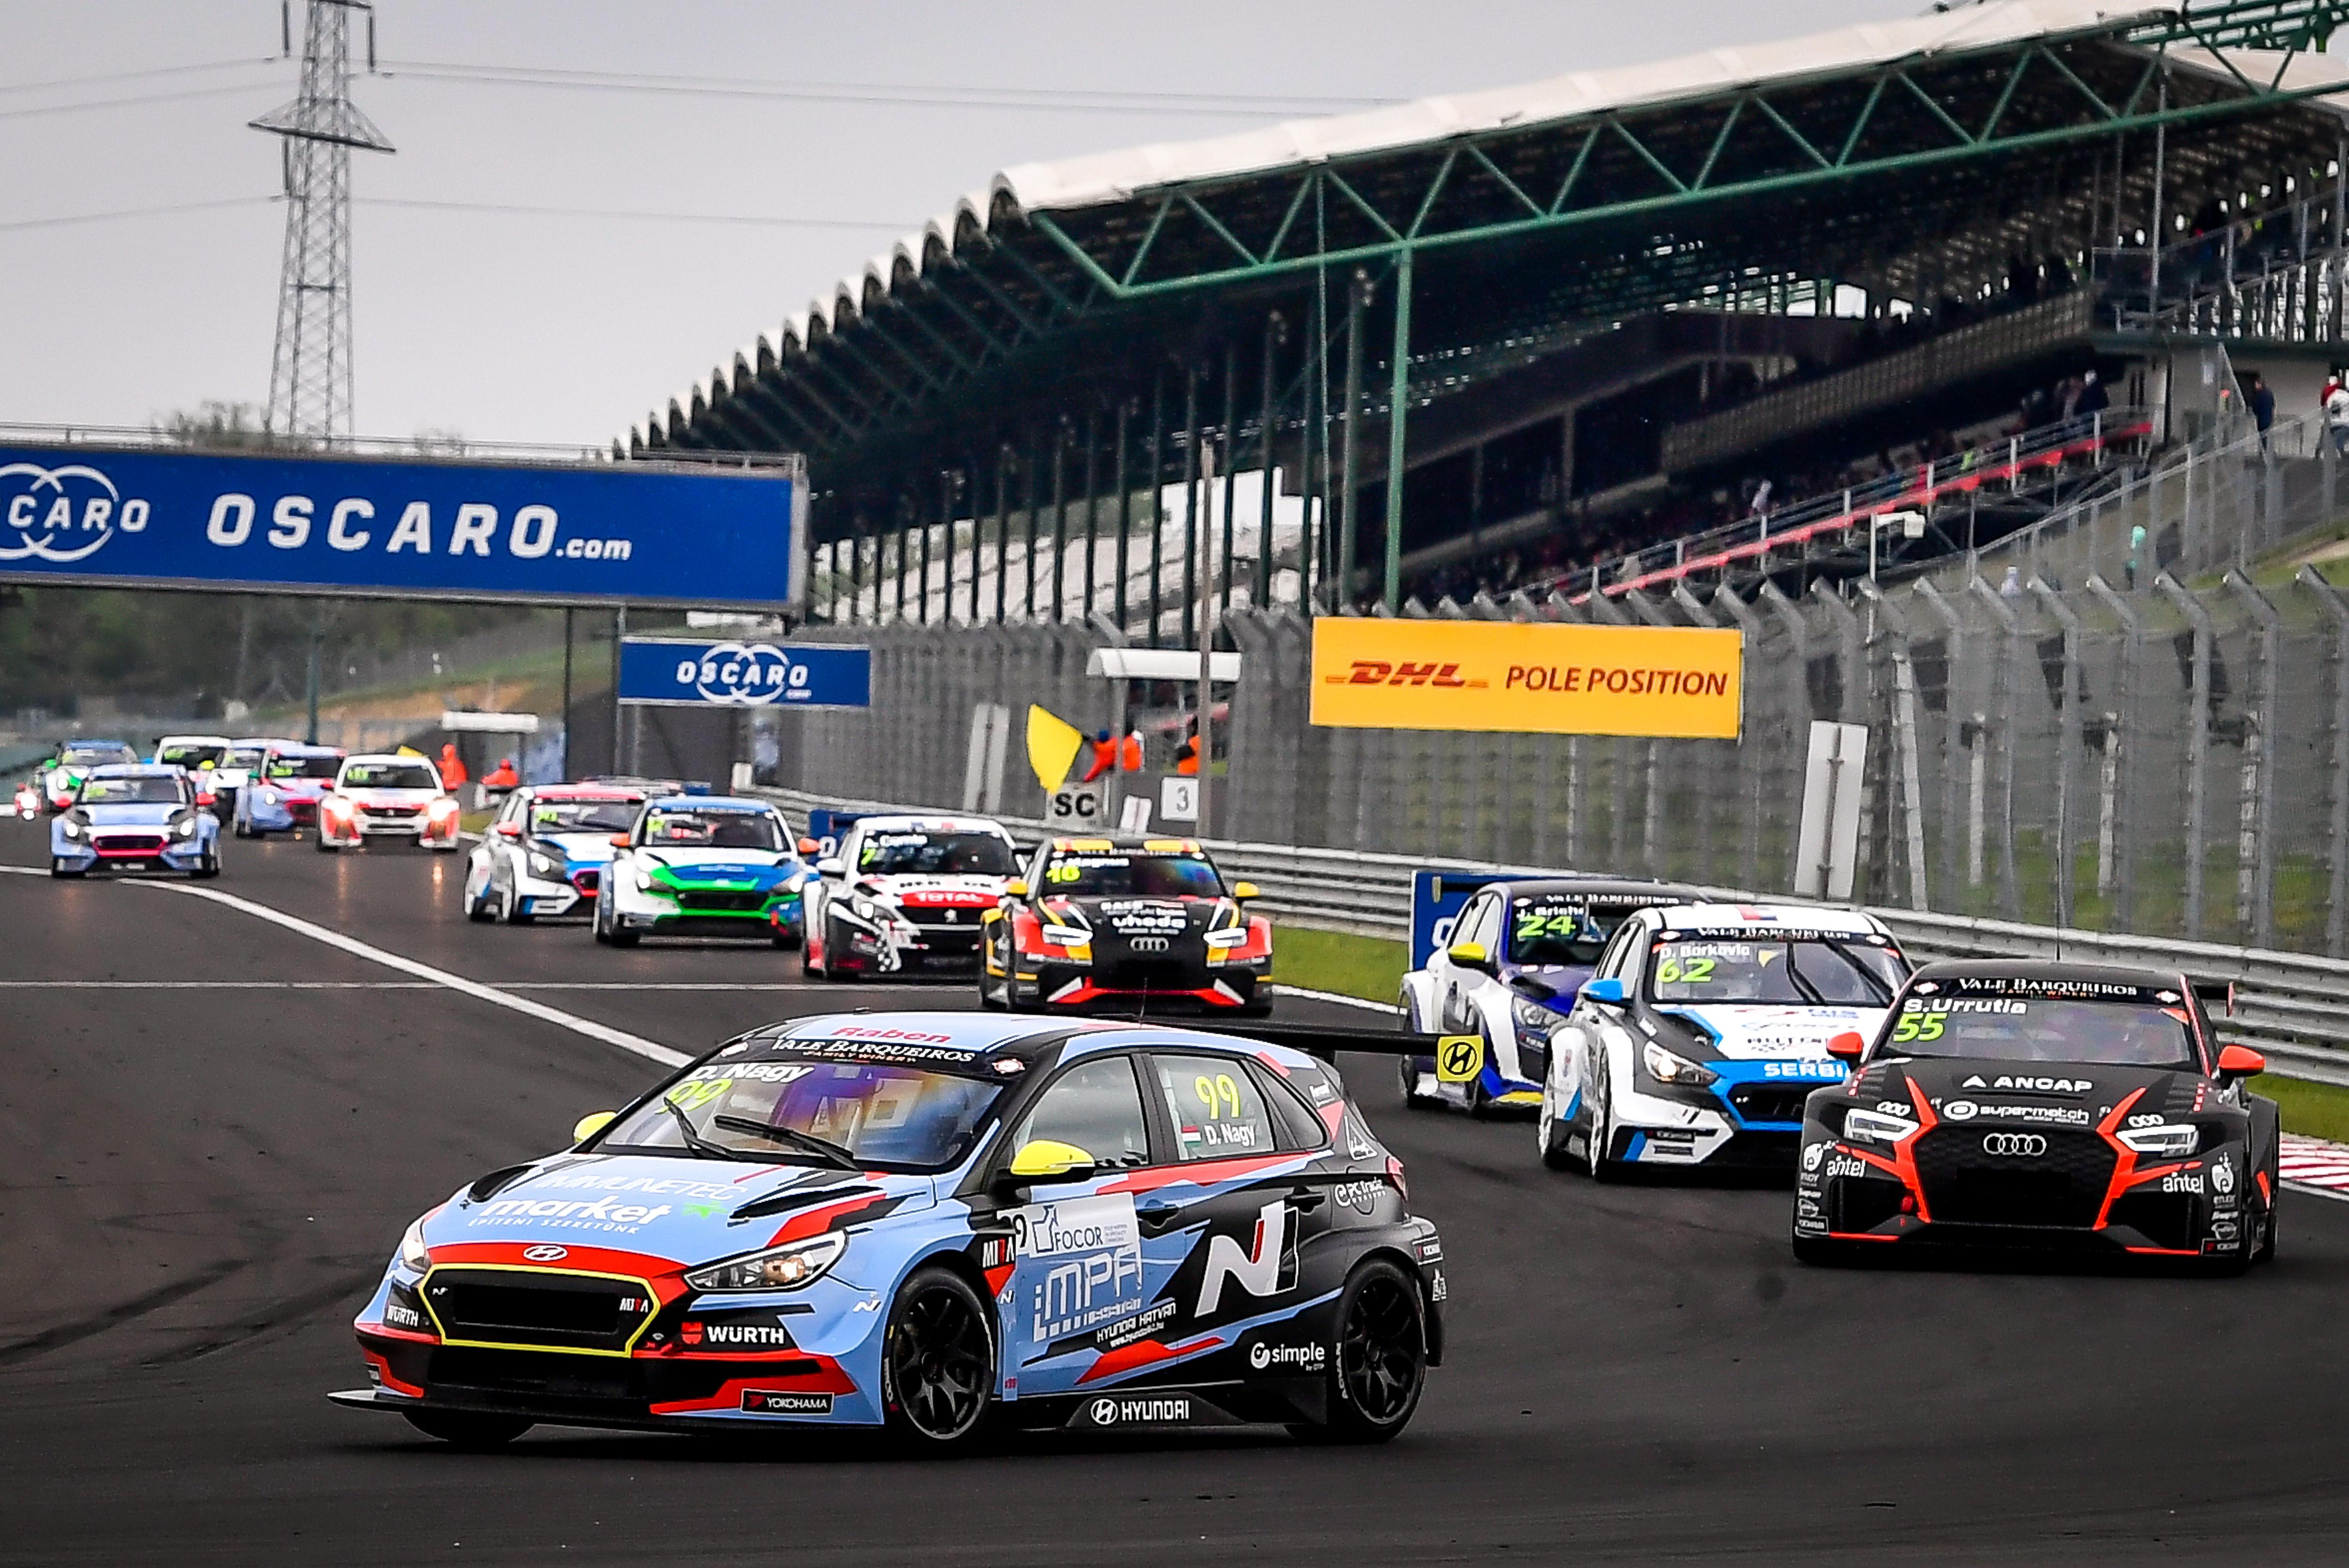 2019-2019_hungaroring_race_2---2019_eur_hungaroring_r2_99_daniel_nagy_6.jpg